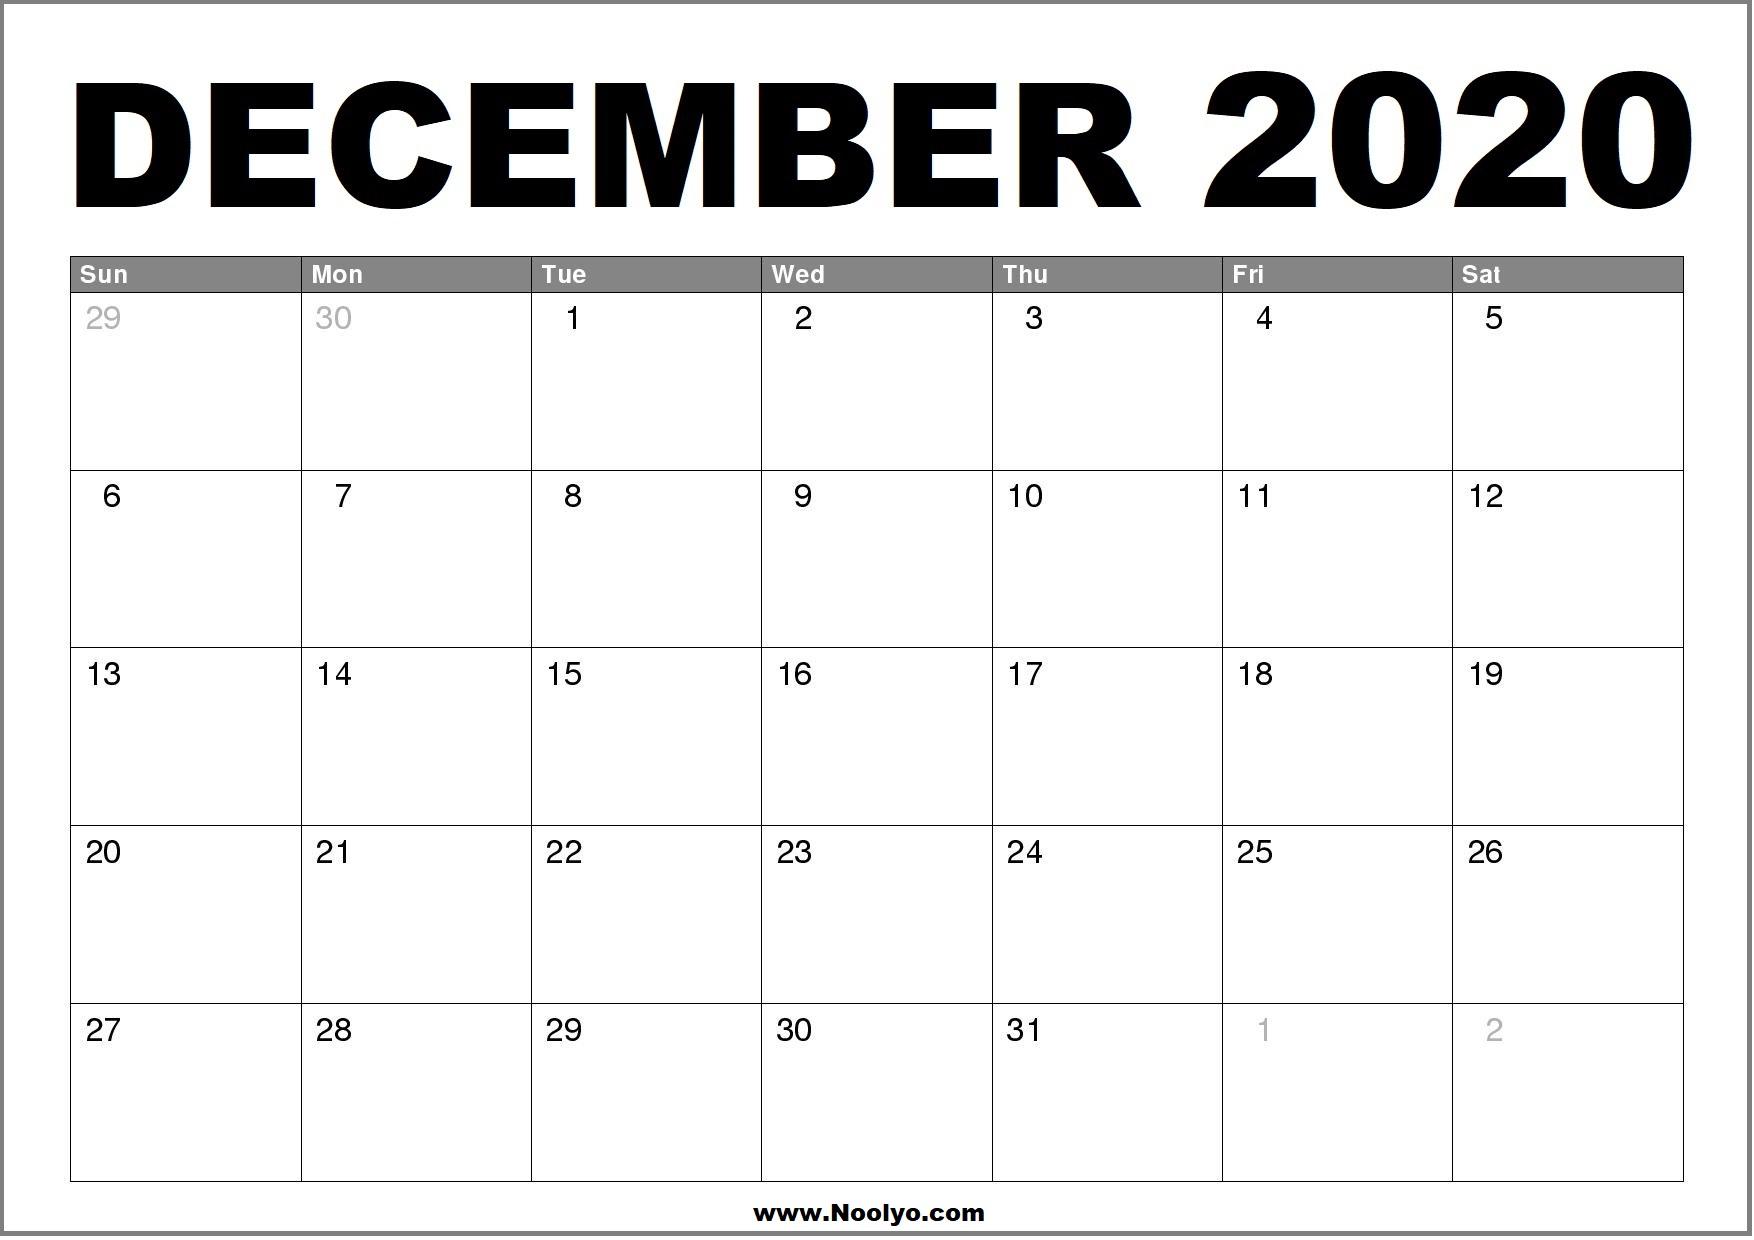 Printable calendar for december 2020 | 2020 Monthly ...